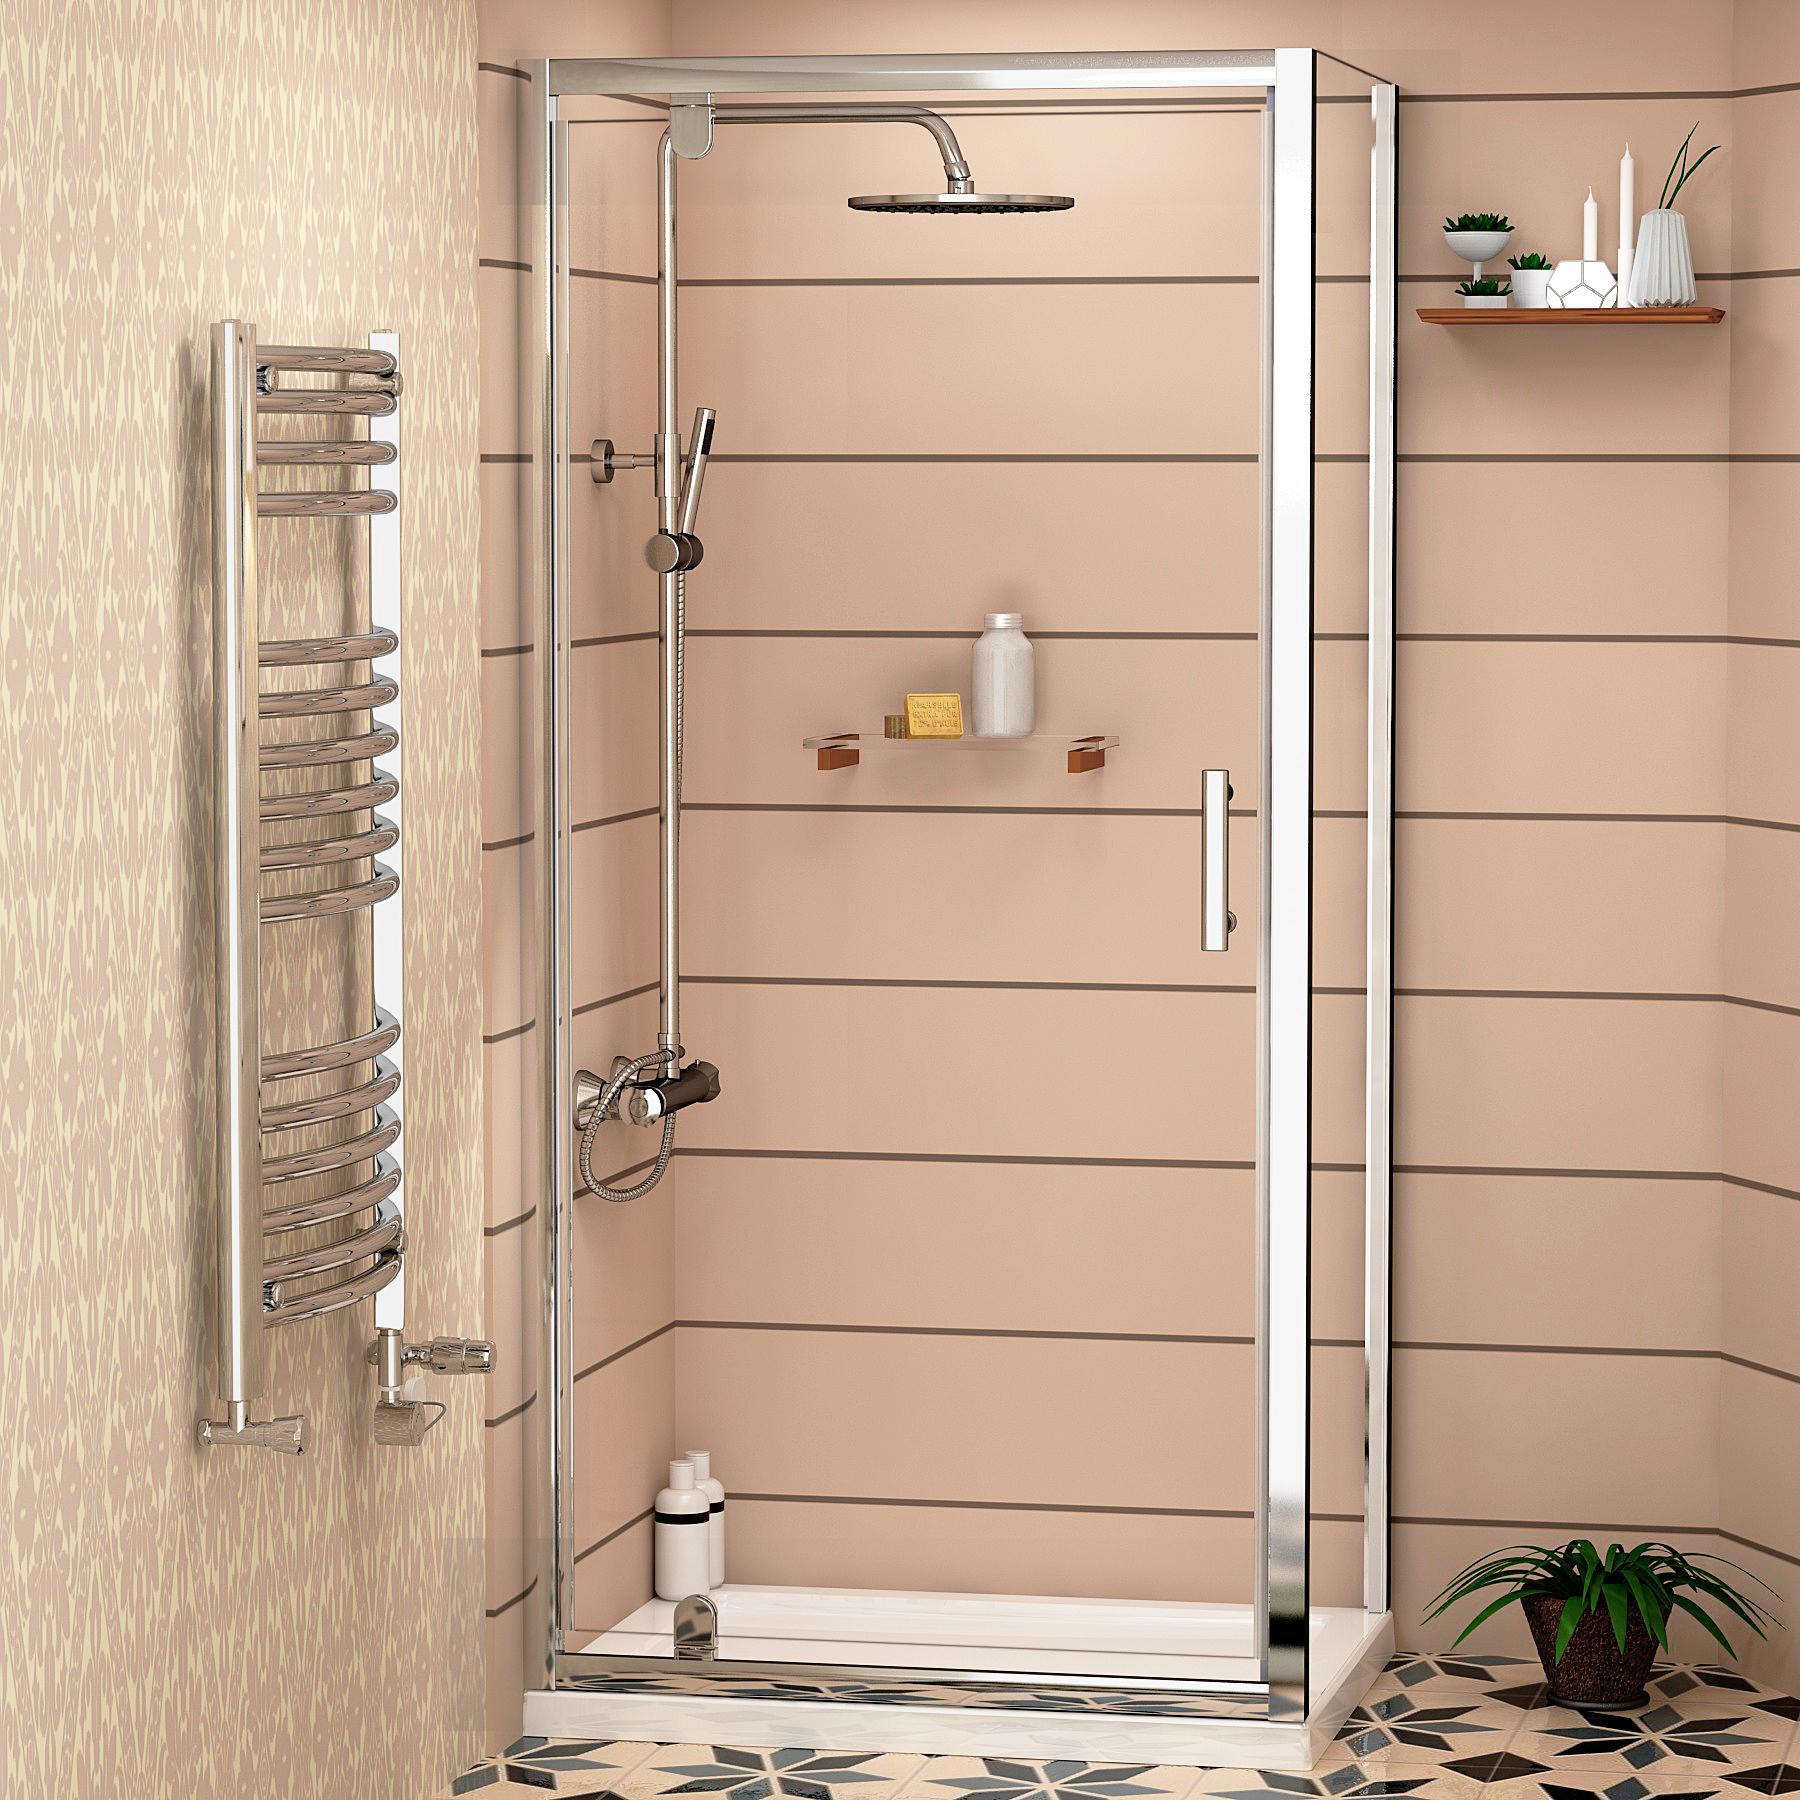 Royal Bathrooms Cube 6mm Square Pivot Door Shower Enclosure  - Various Sizes